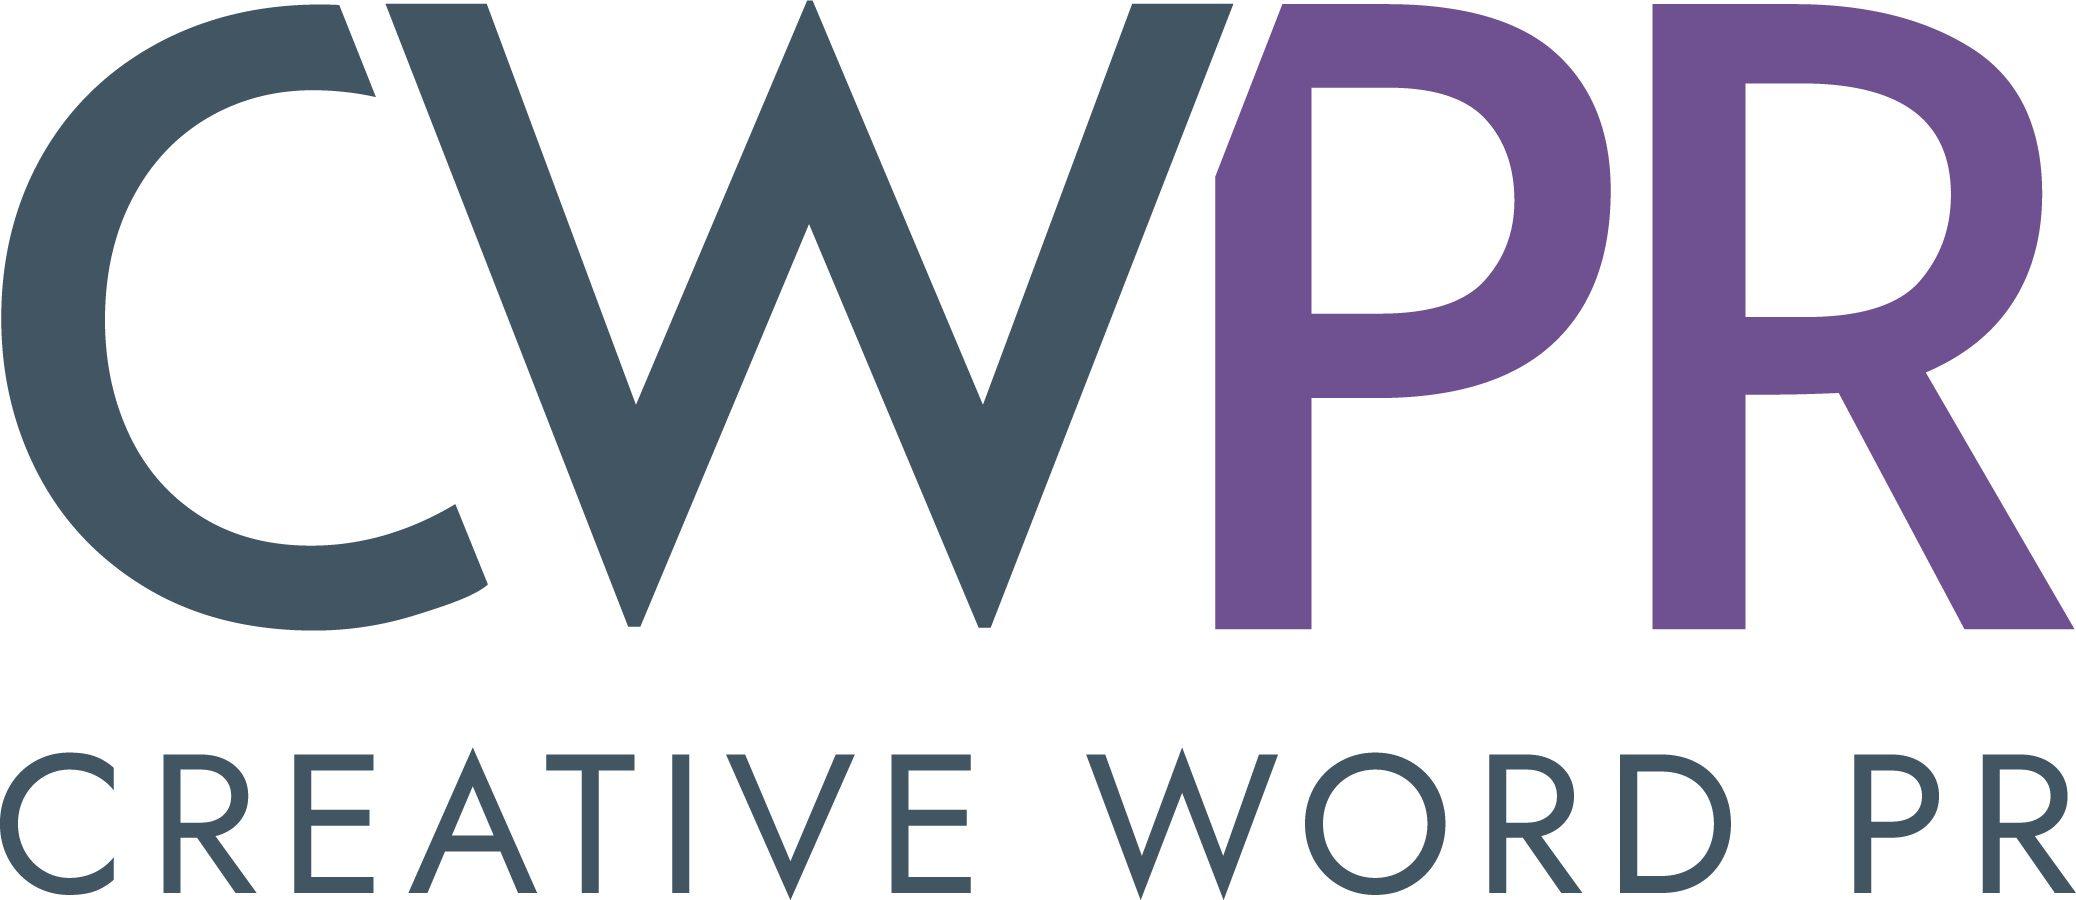 Creative Word PR